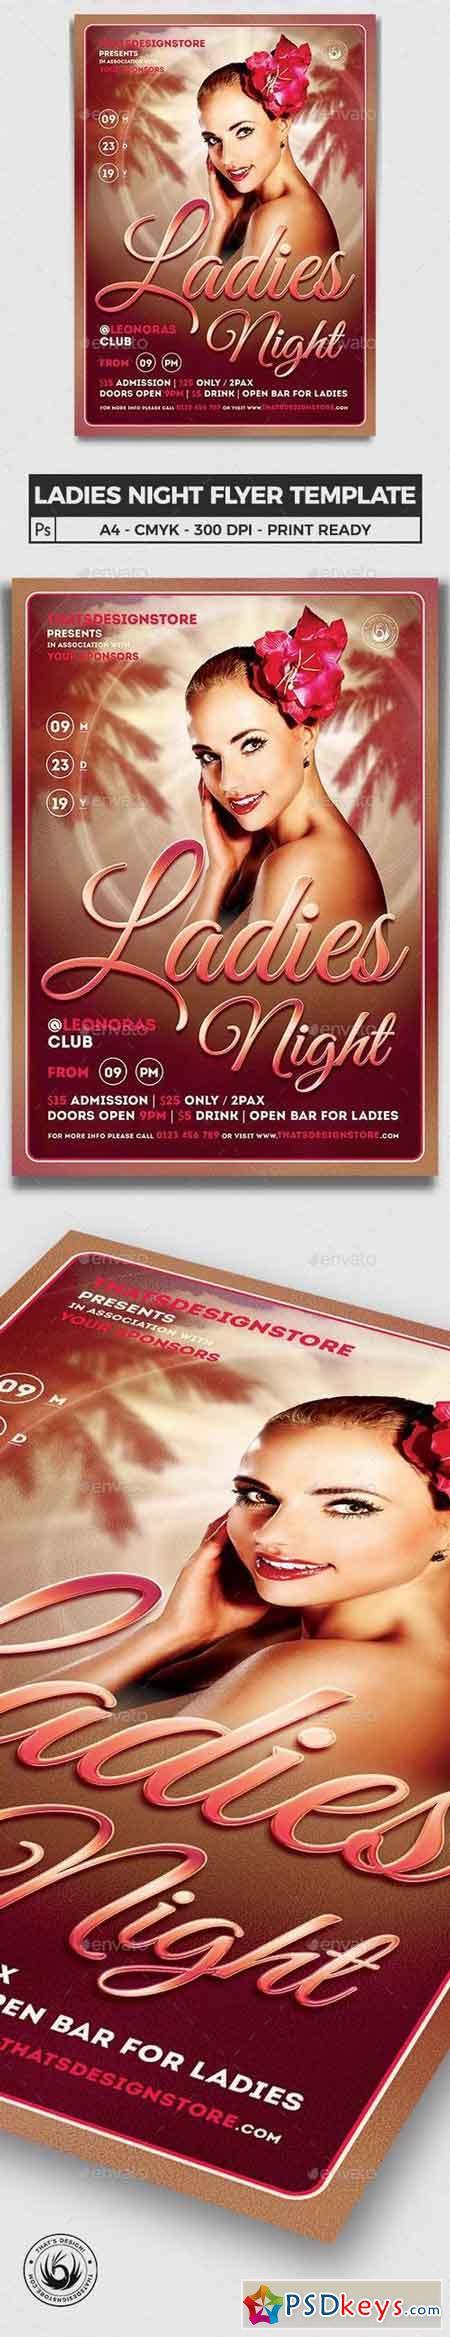 Sensual Ladies Night Flyer Template 6331341